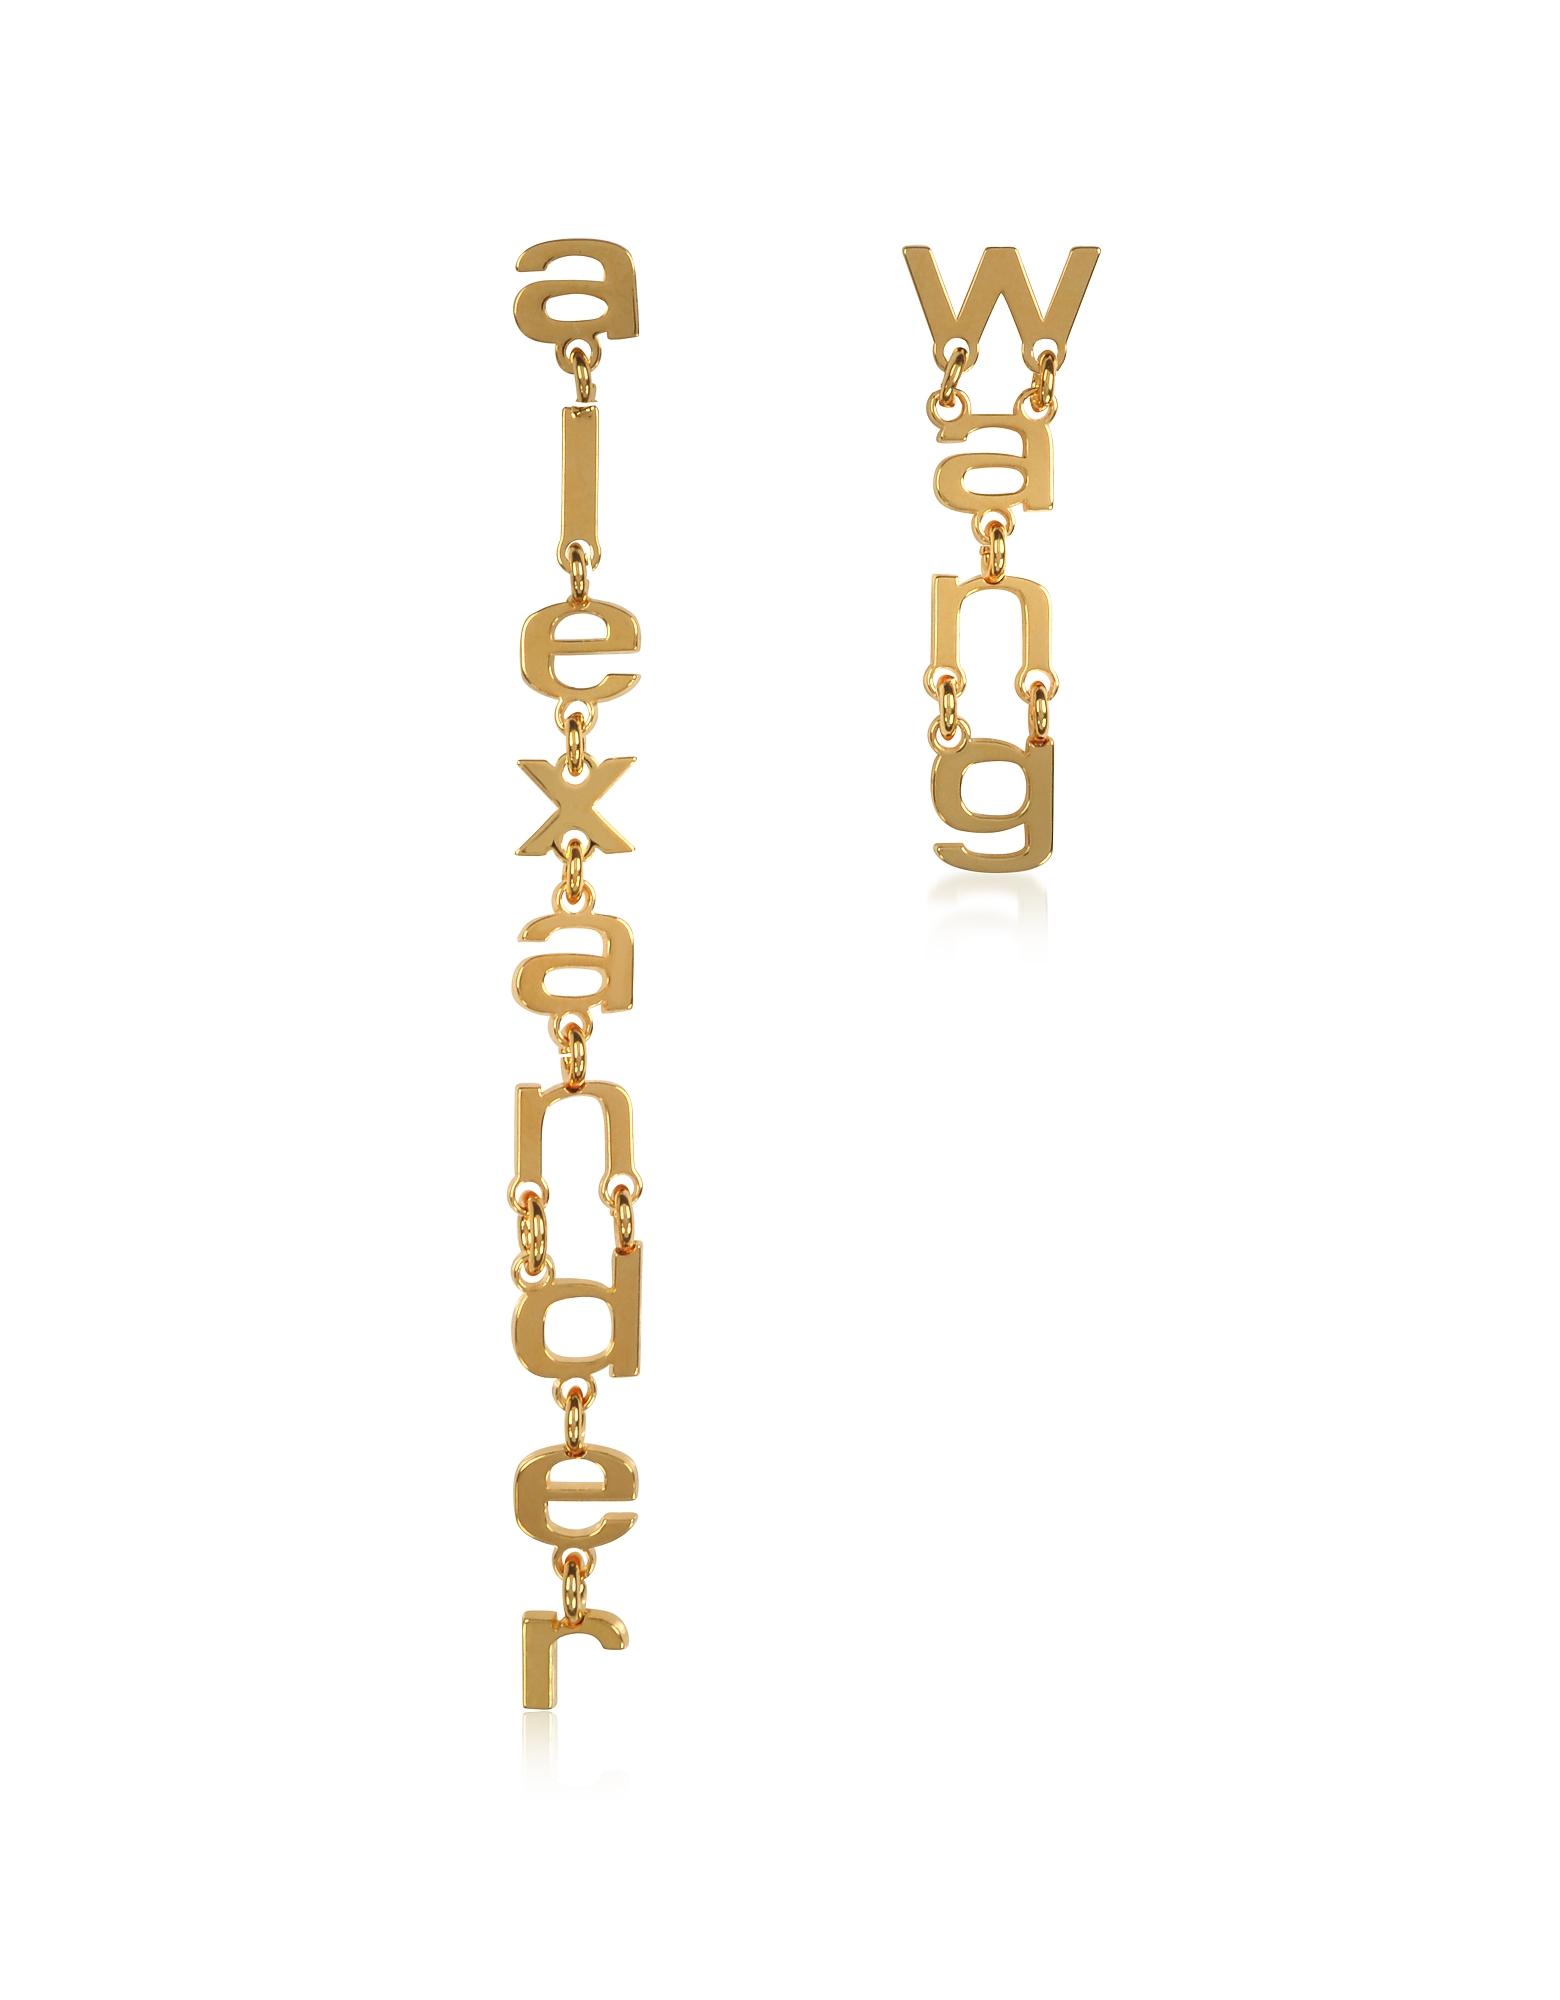 Alexander Wang Earrings, Small Letters Signature Earrings